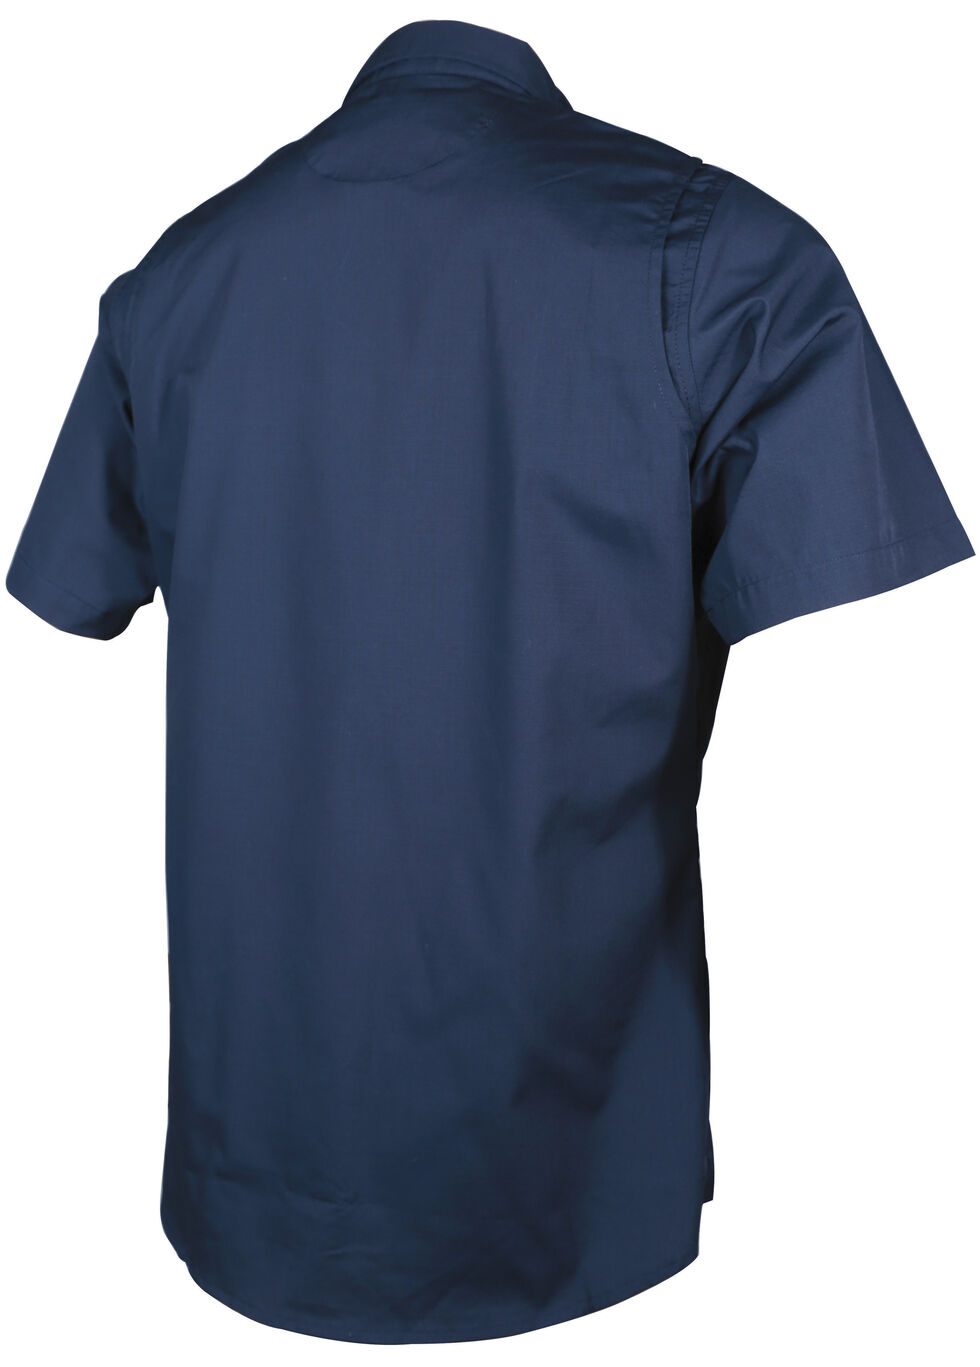 Tru-Spec Men's Navy 24-7 Short Sleeve Dress Shirt , Navy, hi-res